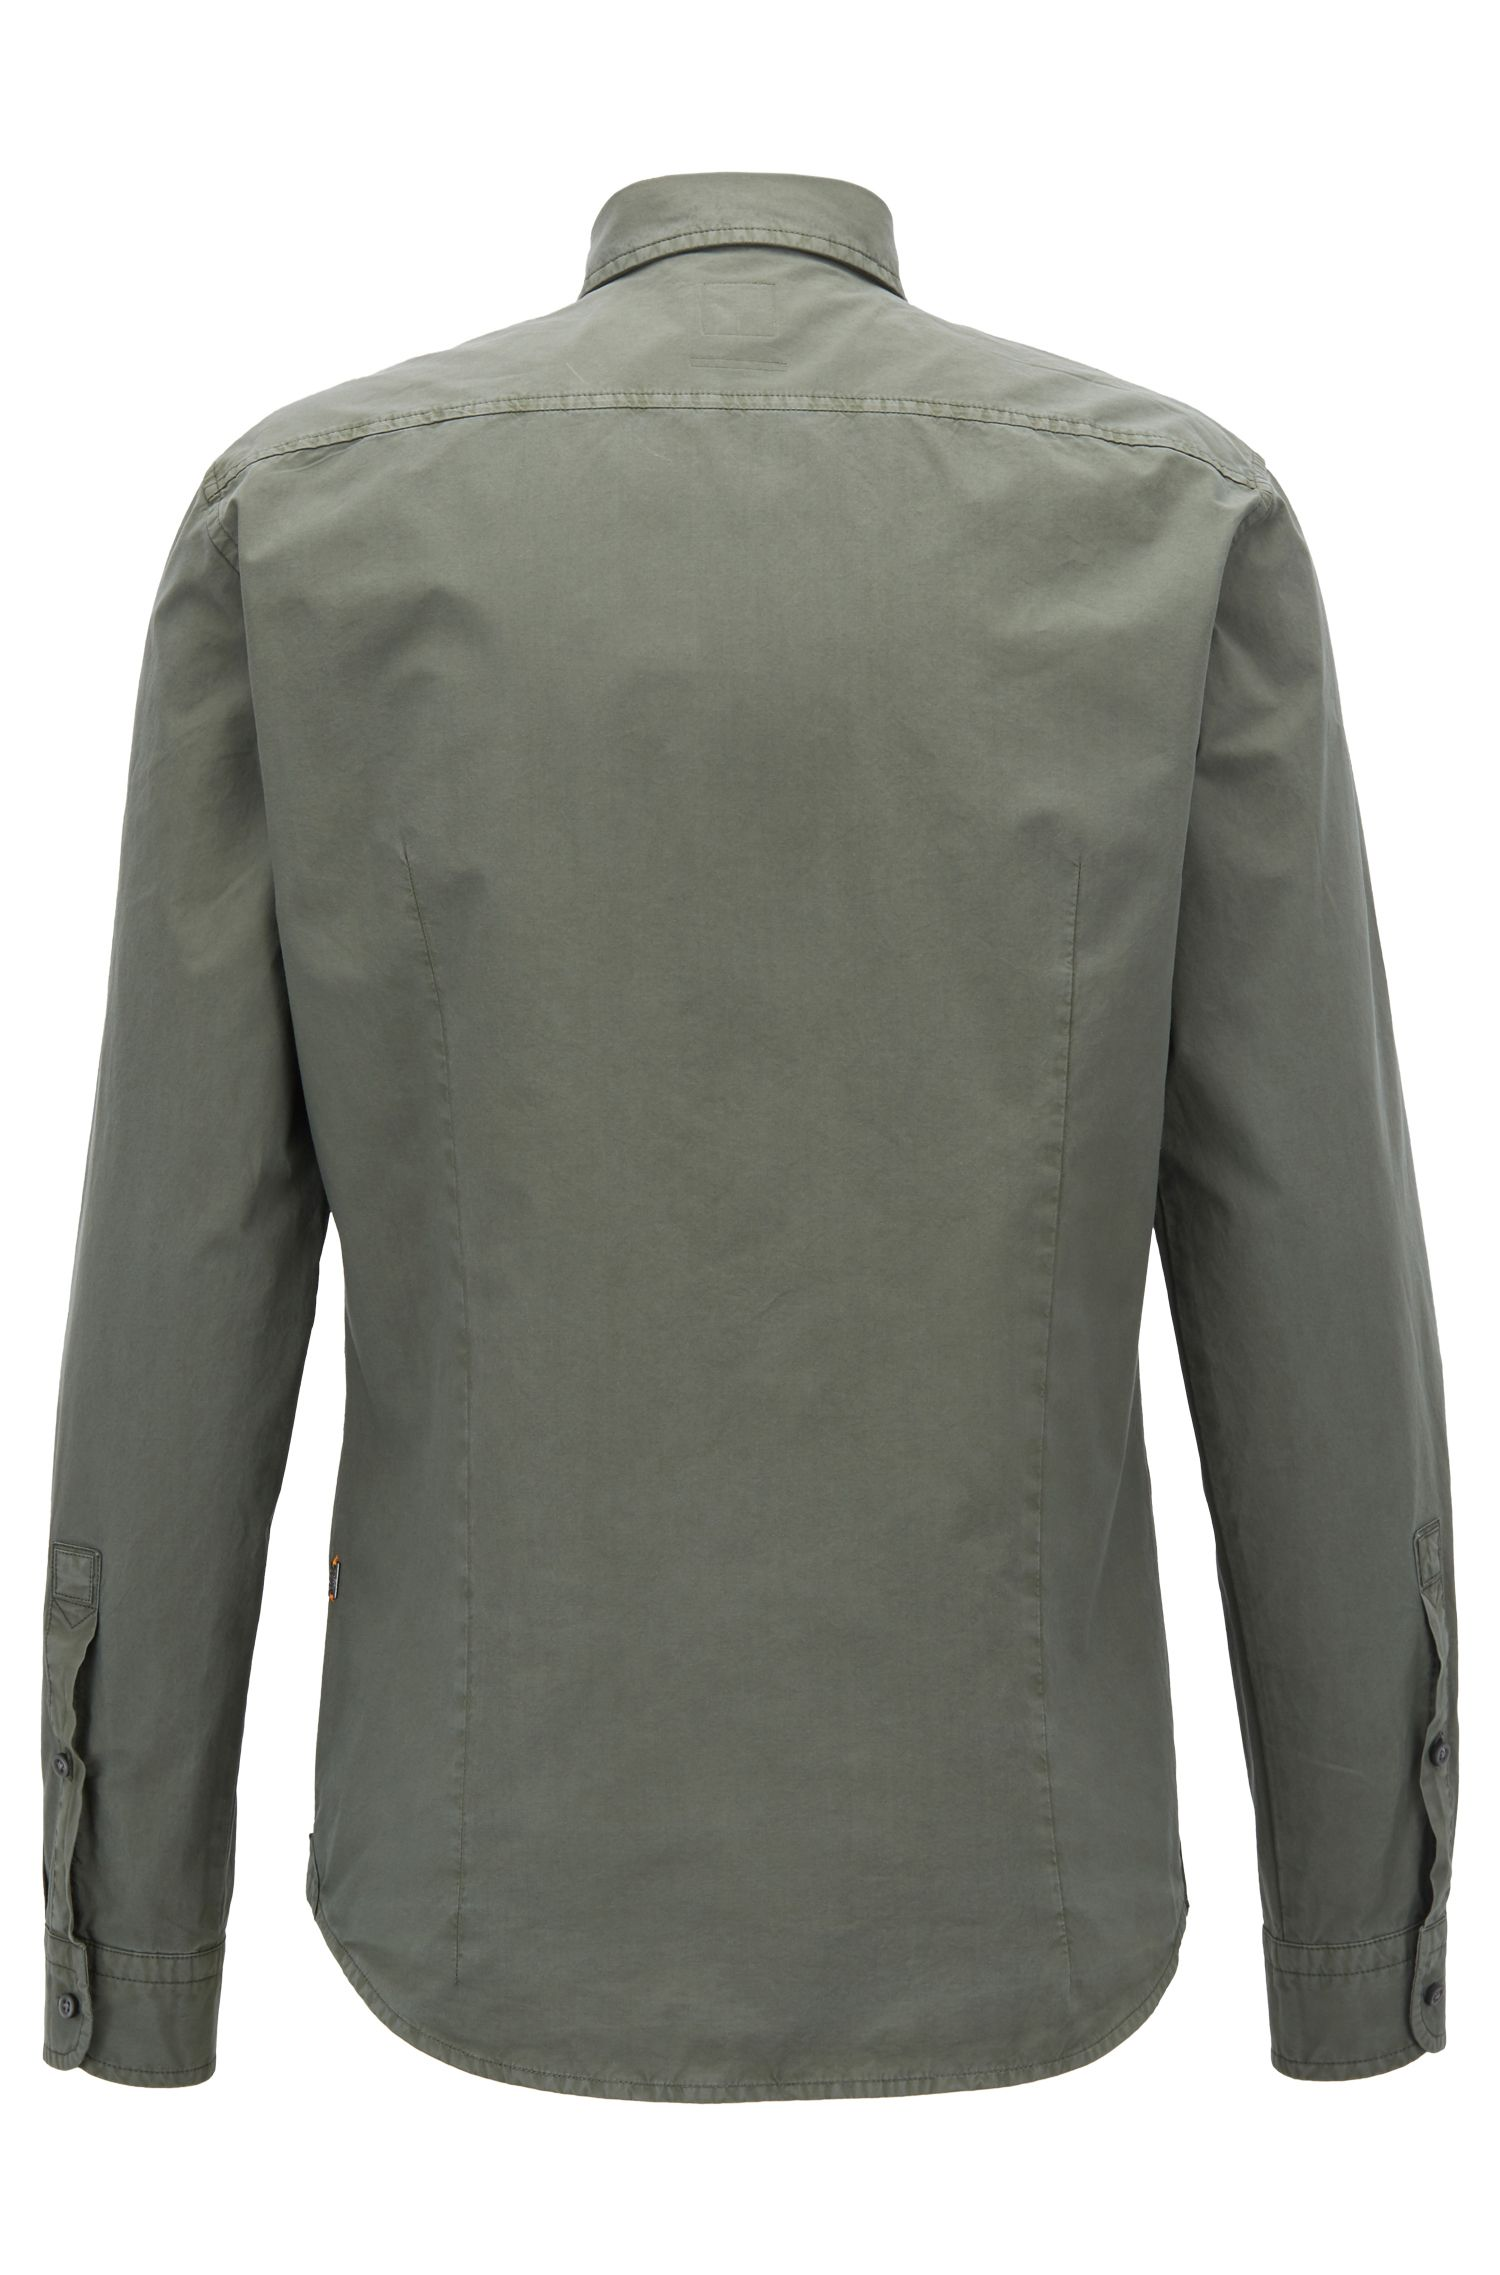 Hugo Boss - Slim-fit shirt in paper-touch cotton poplin - 3